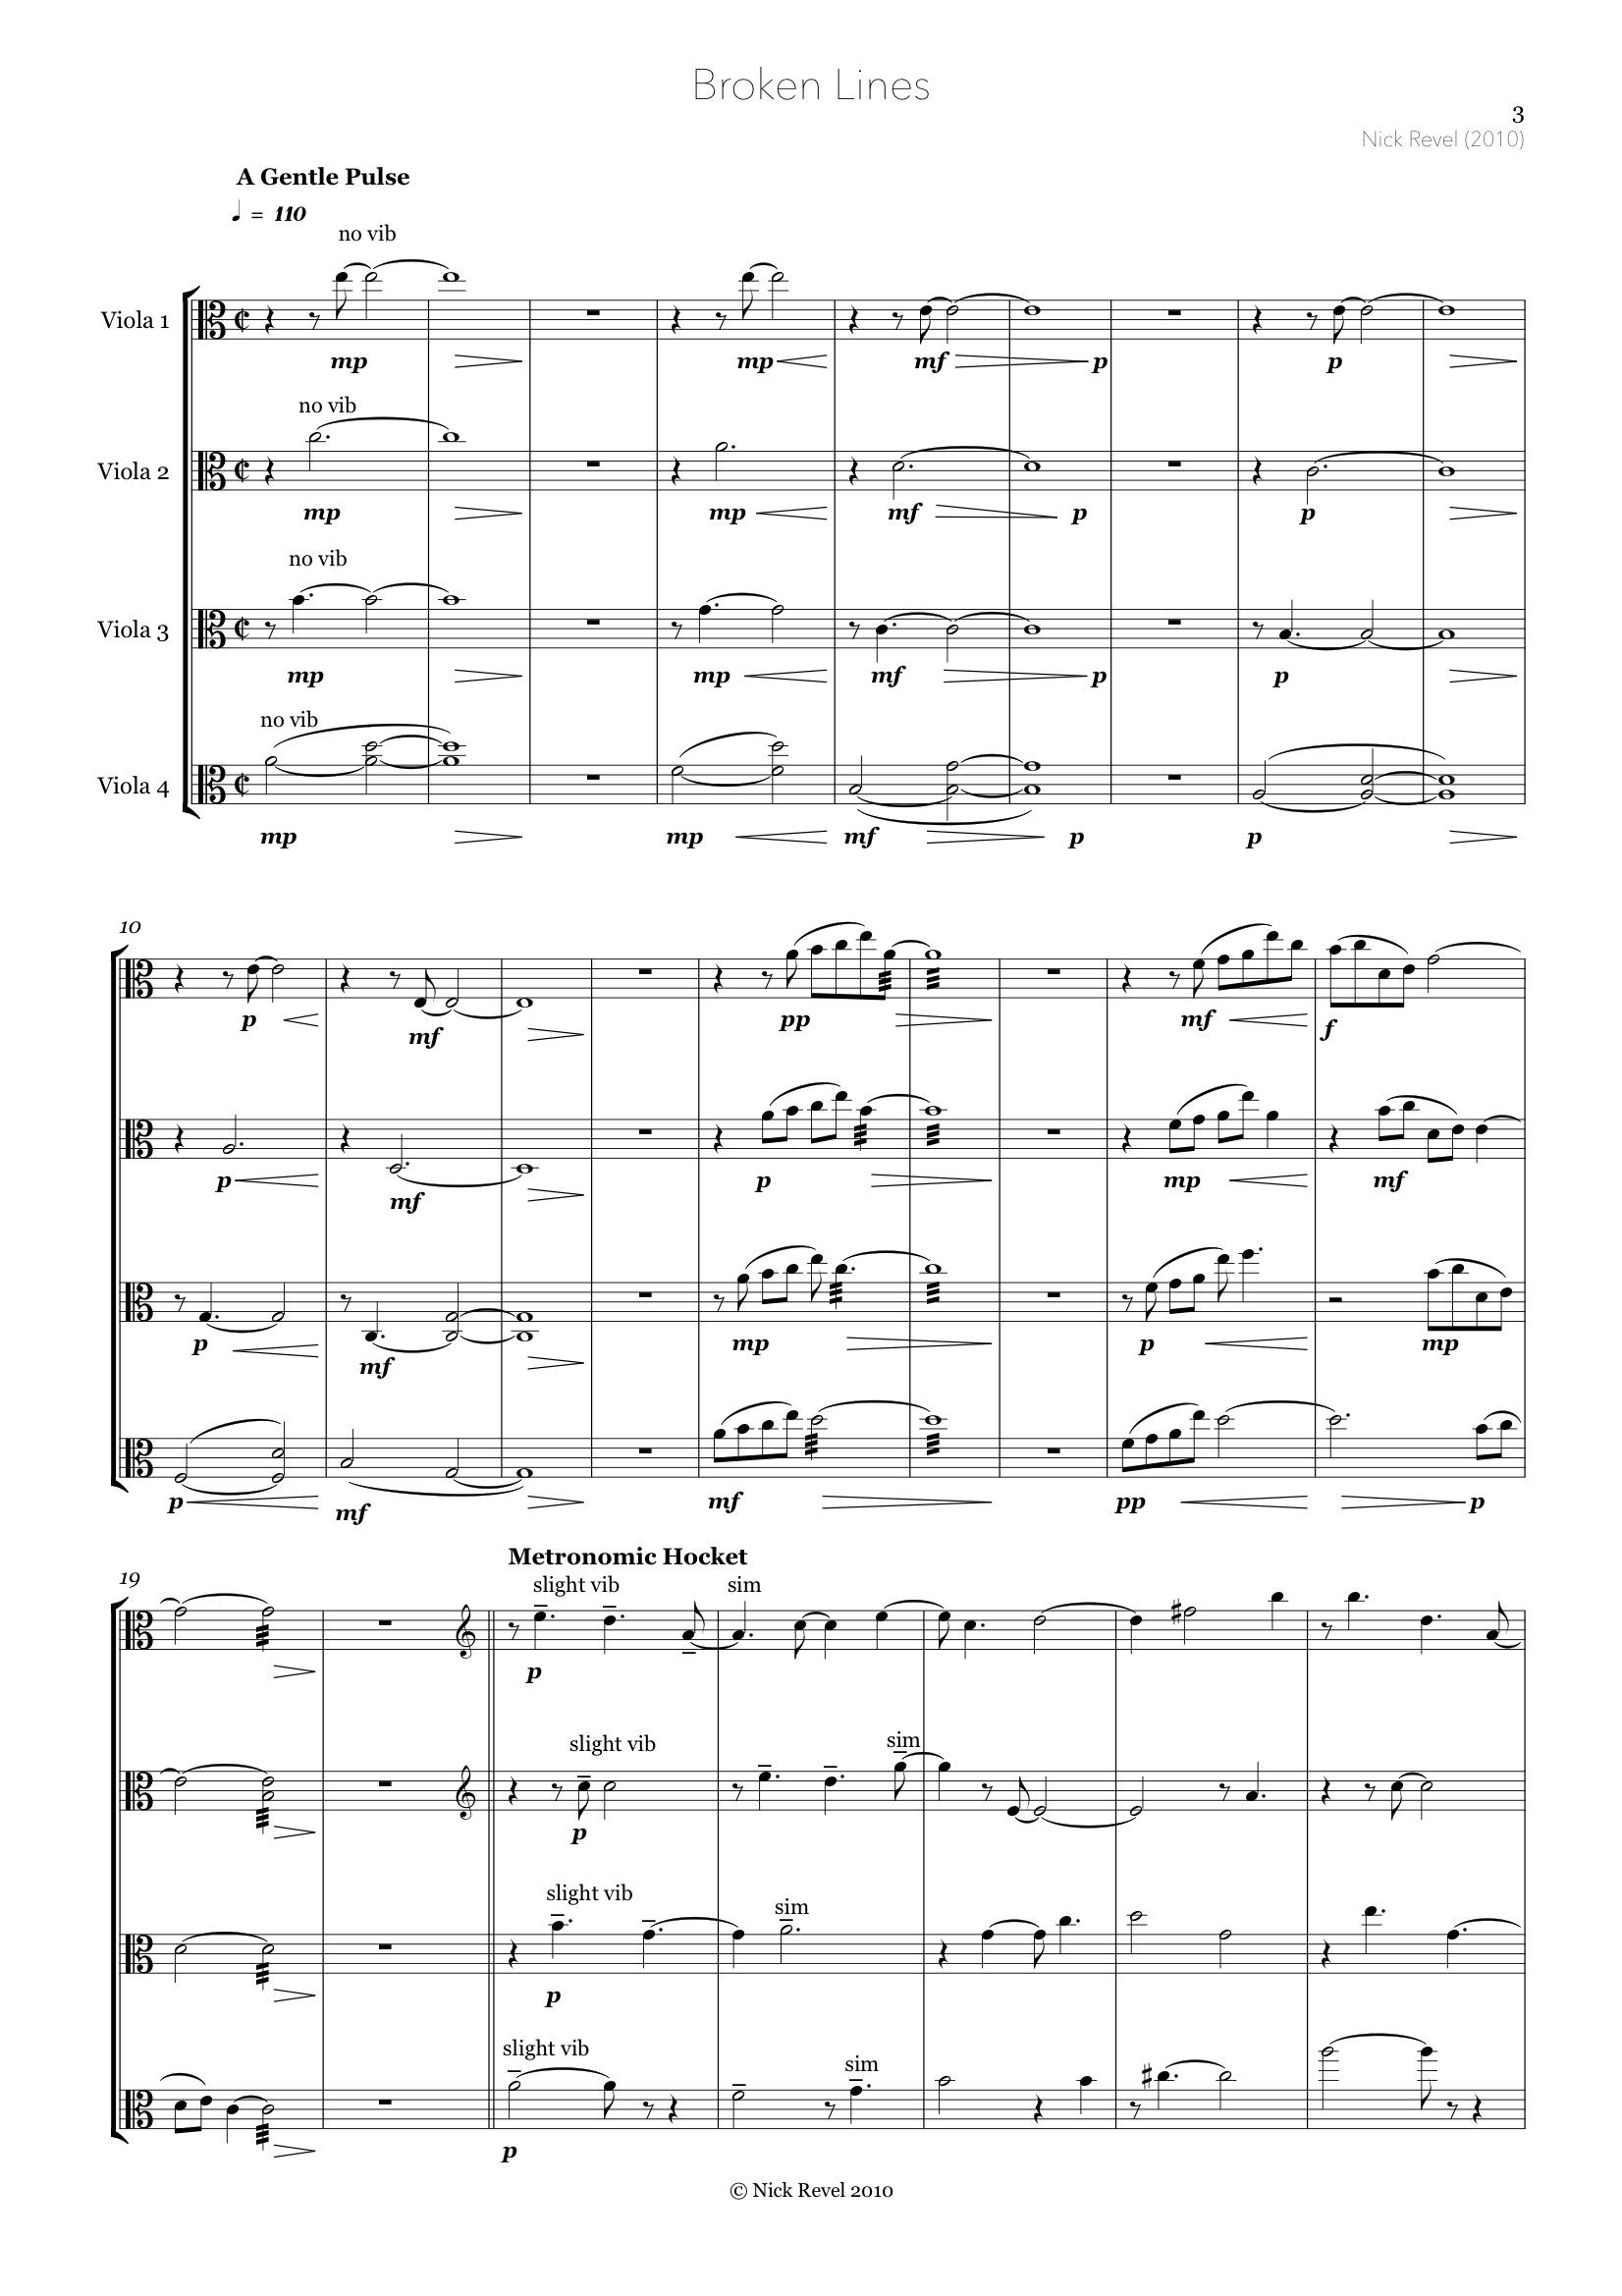 Broken Lines - Viola Quartet Score, 9.25.17 3.jpeg